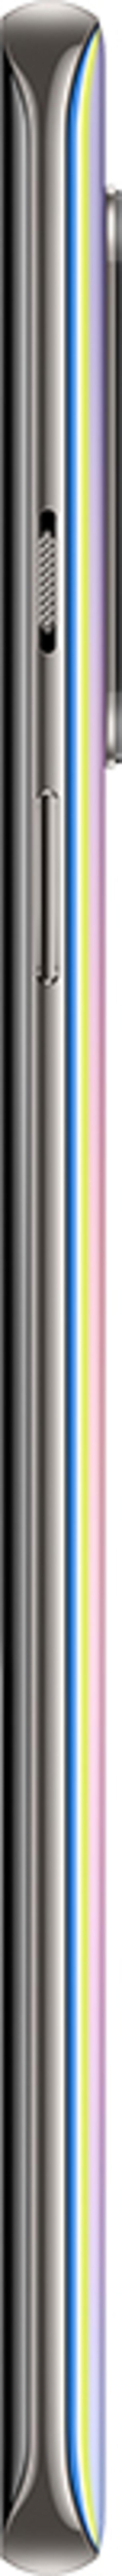 oneplus_8_interstellarglow_side_003.jpg